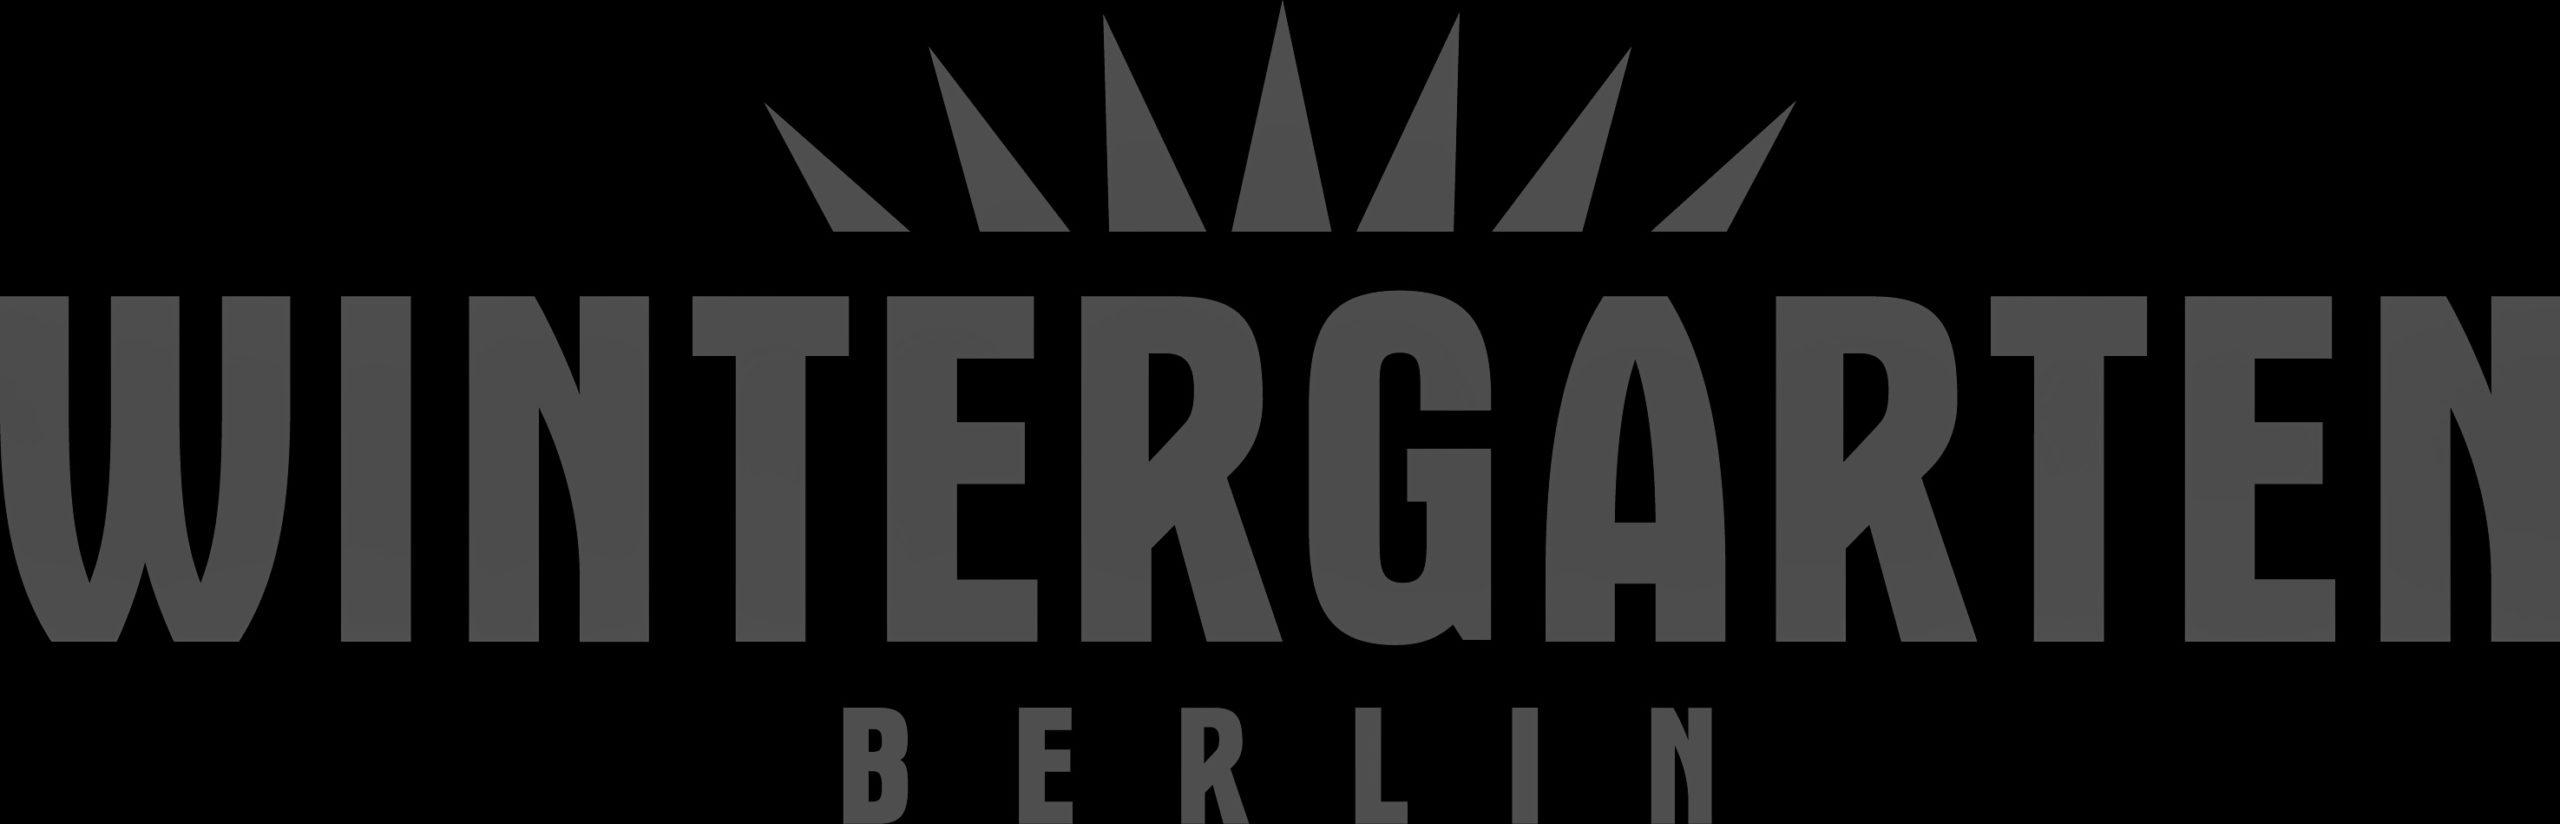 00_Wintergarten_Berlin_Logo-01